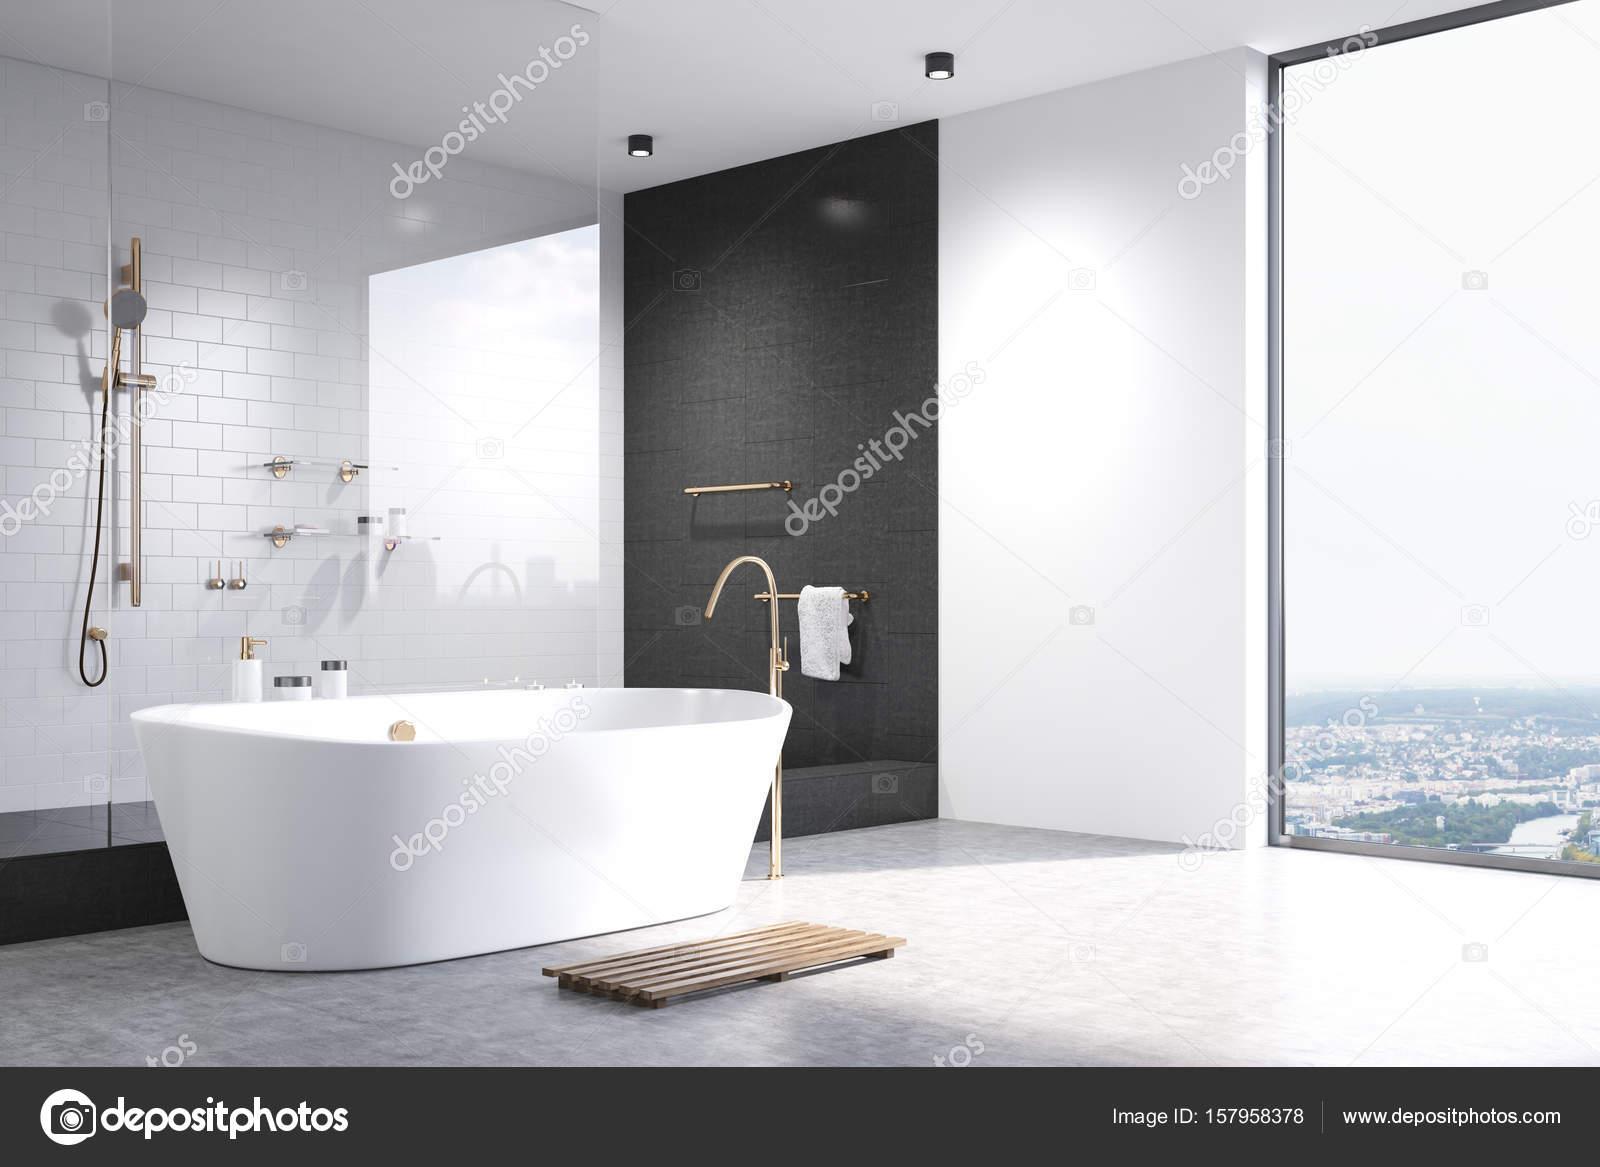 Zwarte Tegels Badkamer : Witte badkamer met zwarte tegels hoek u stockfoto denisismagilov